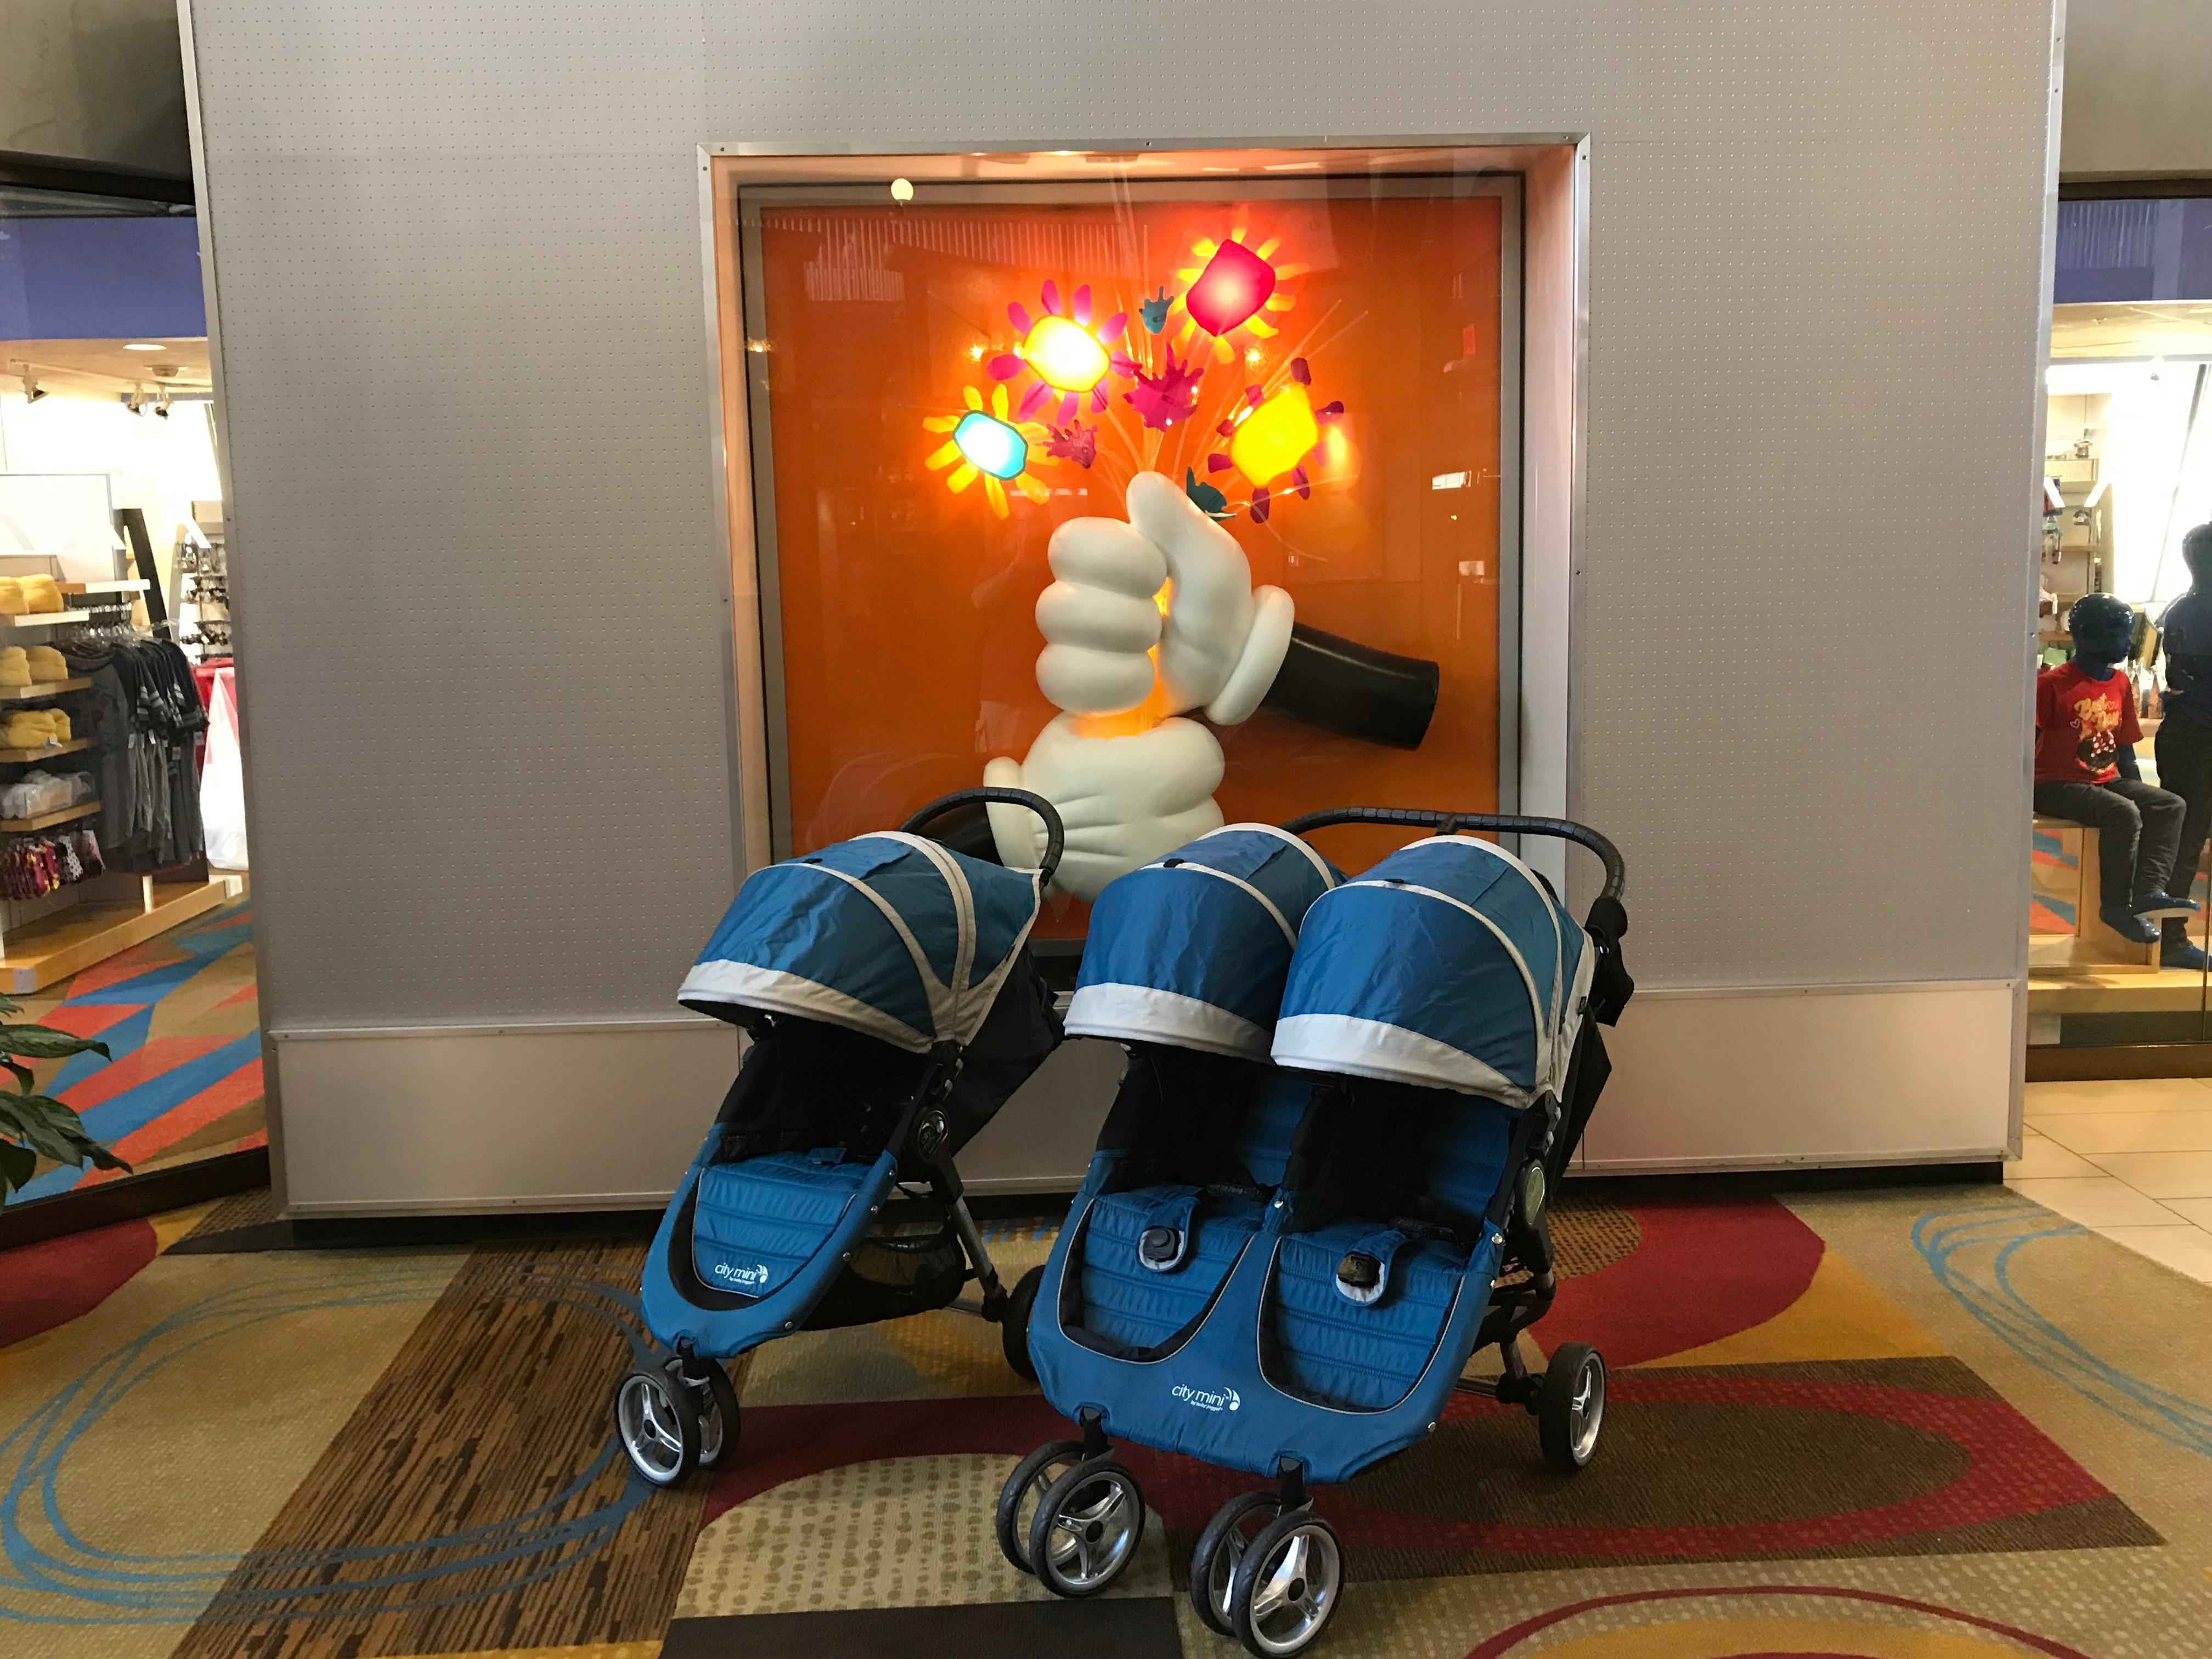 Stroller Rentals Disney image 79